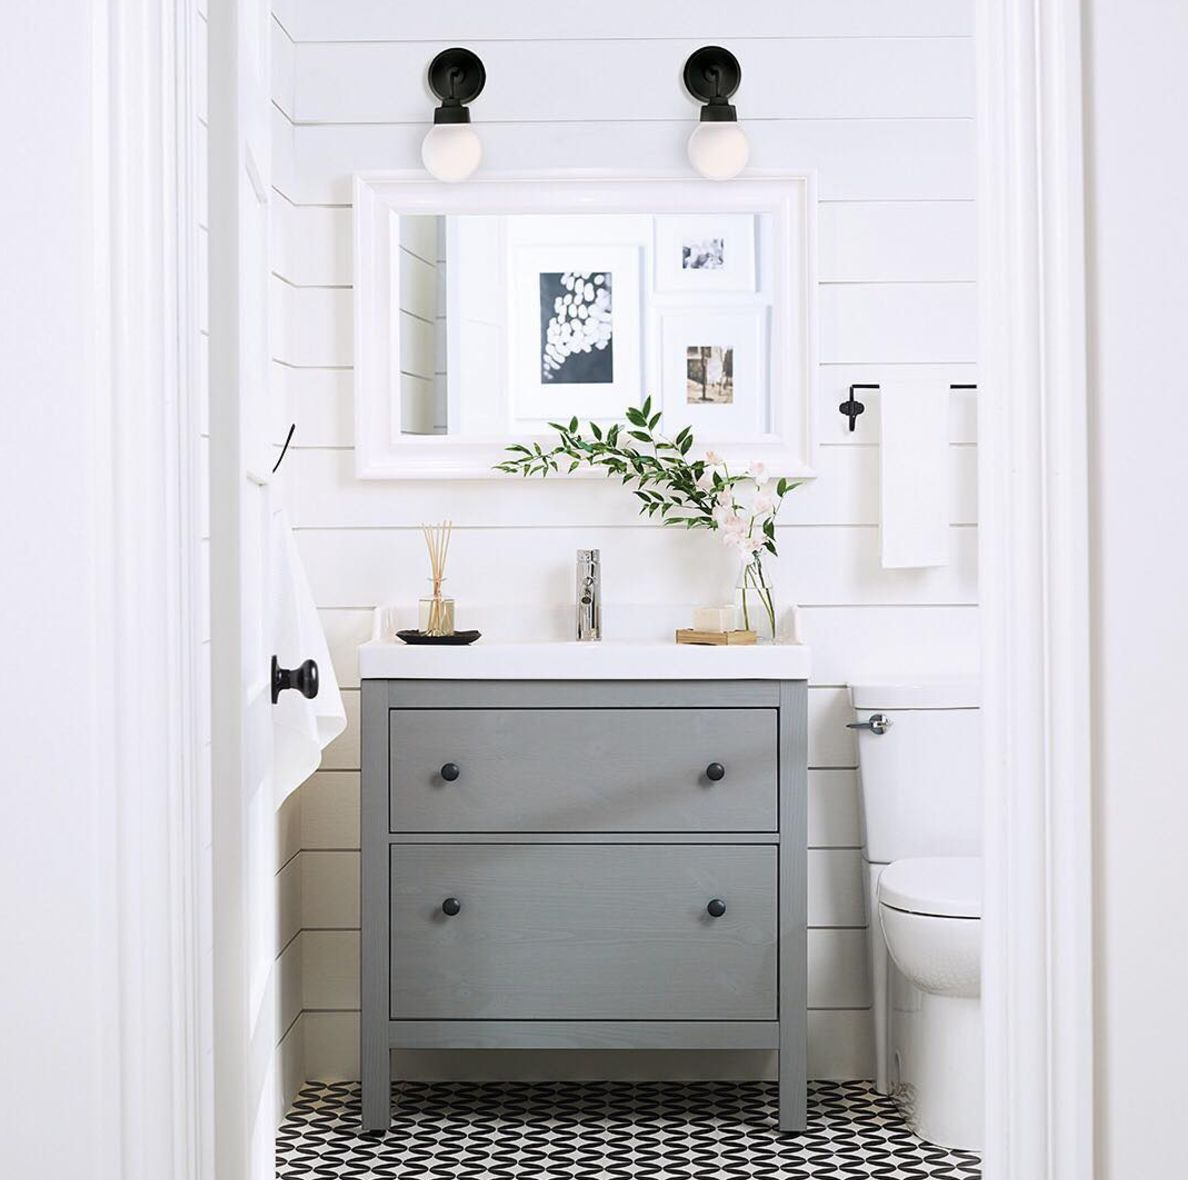 Warefair Com: Finest Wayfair Bathroom Accessories Décor